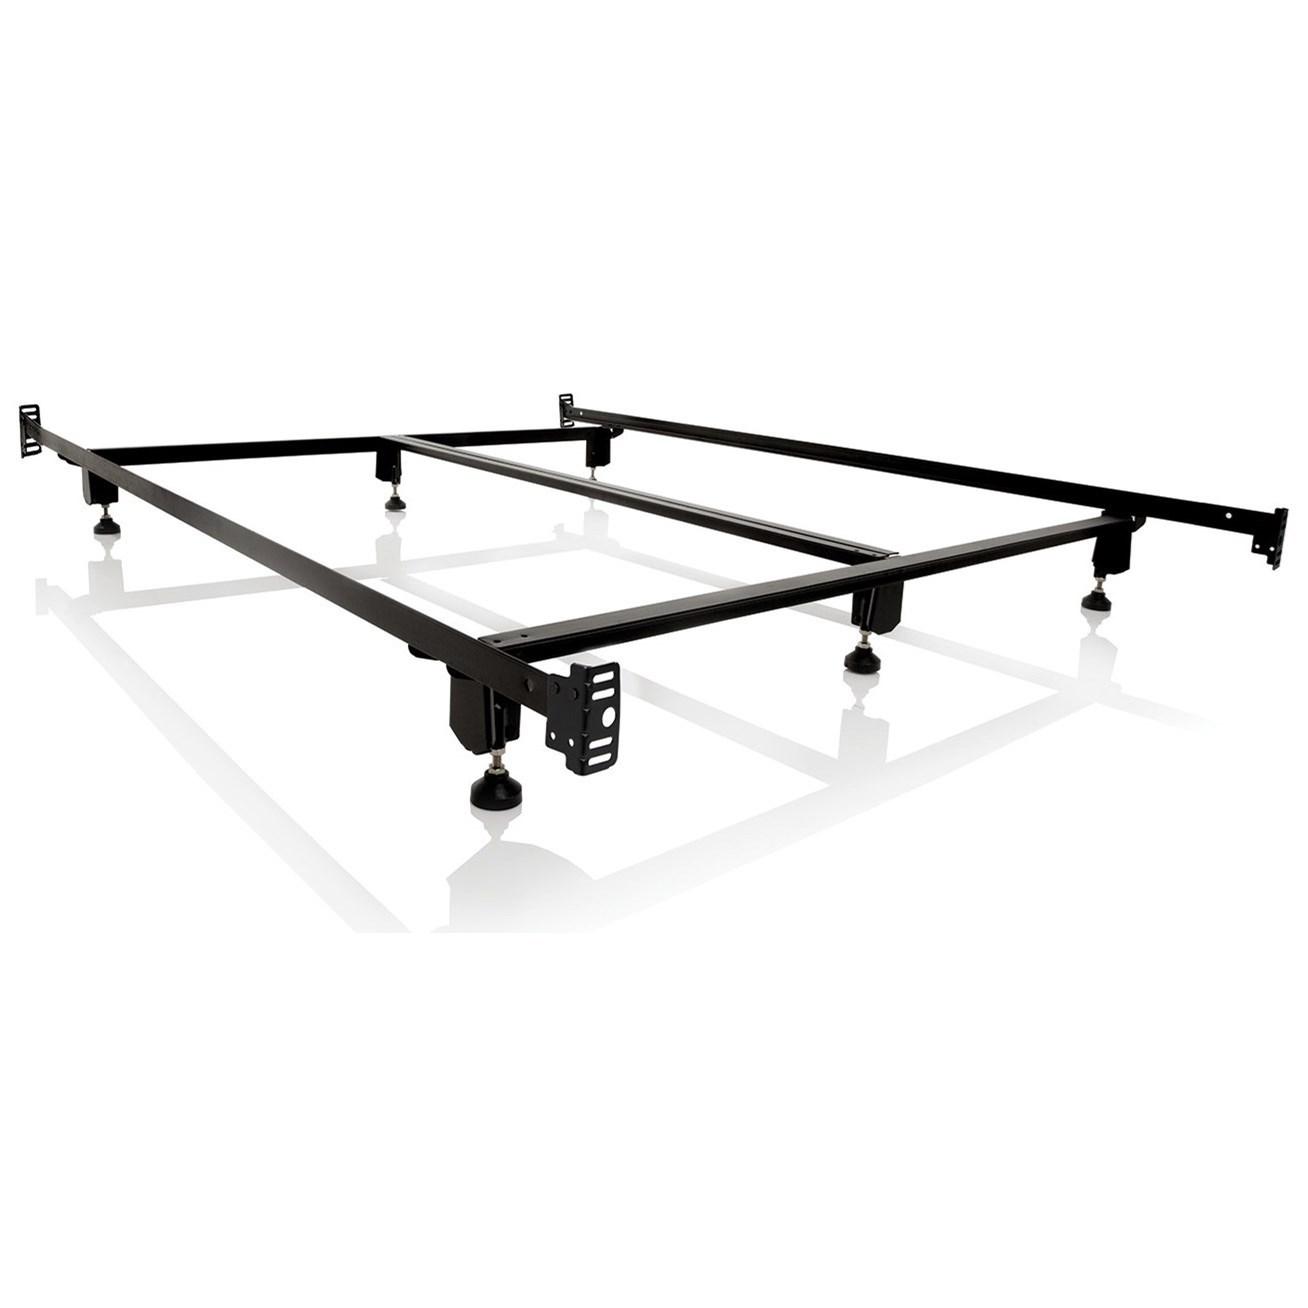 Malouf Steelock Twin Steelock Bolt-On Bed Frame - Item Number: STHFTTSL